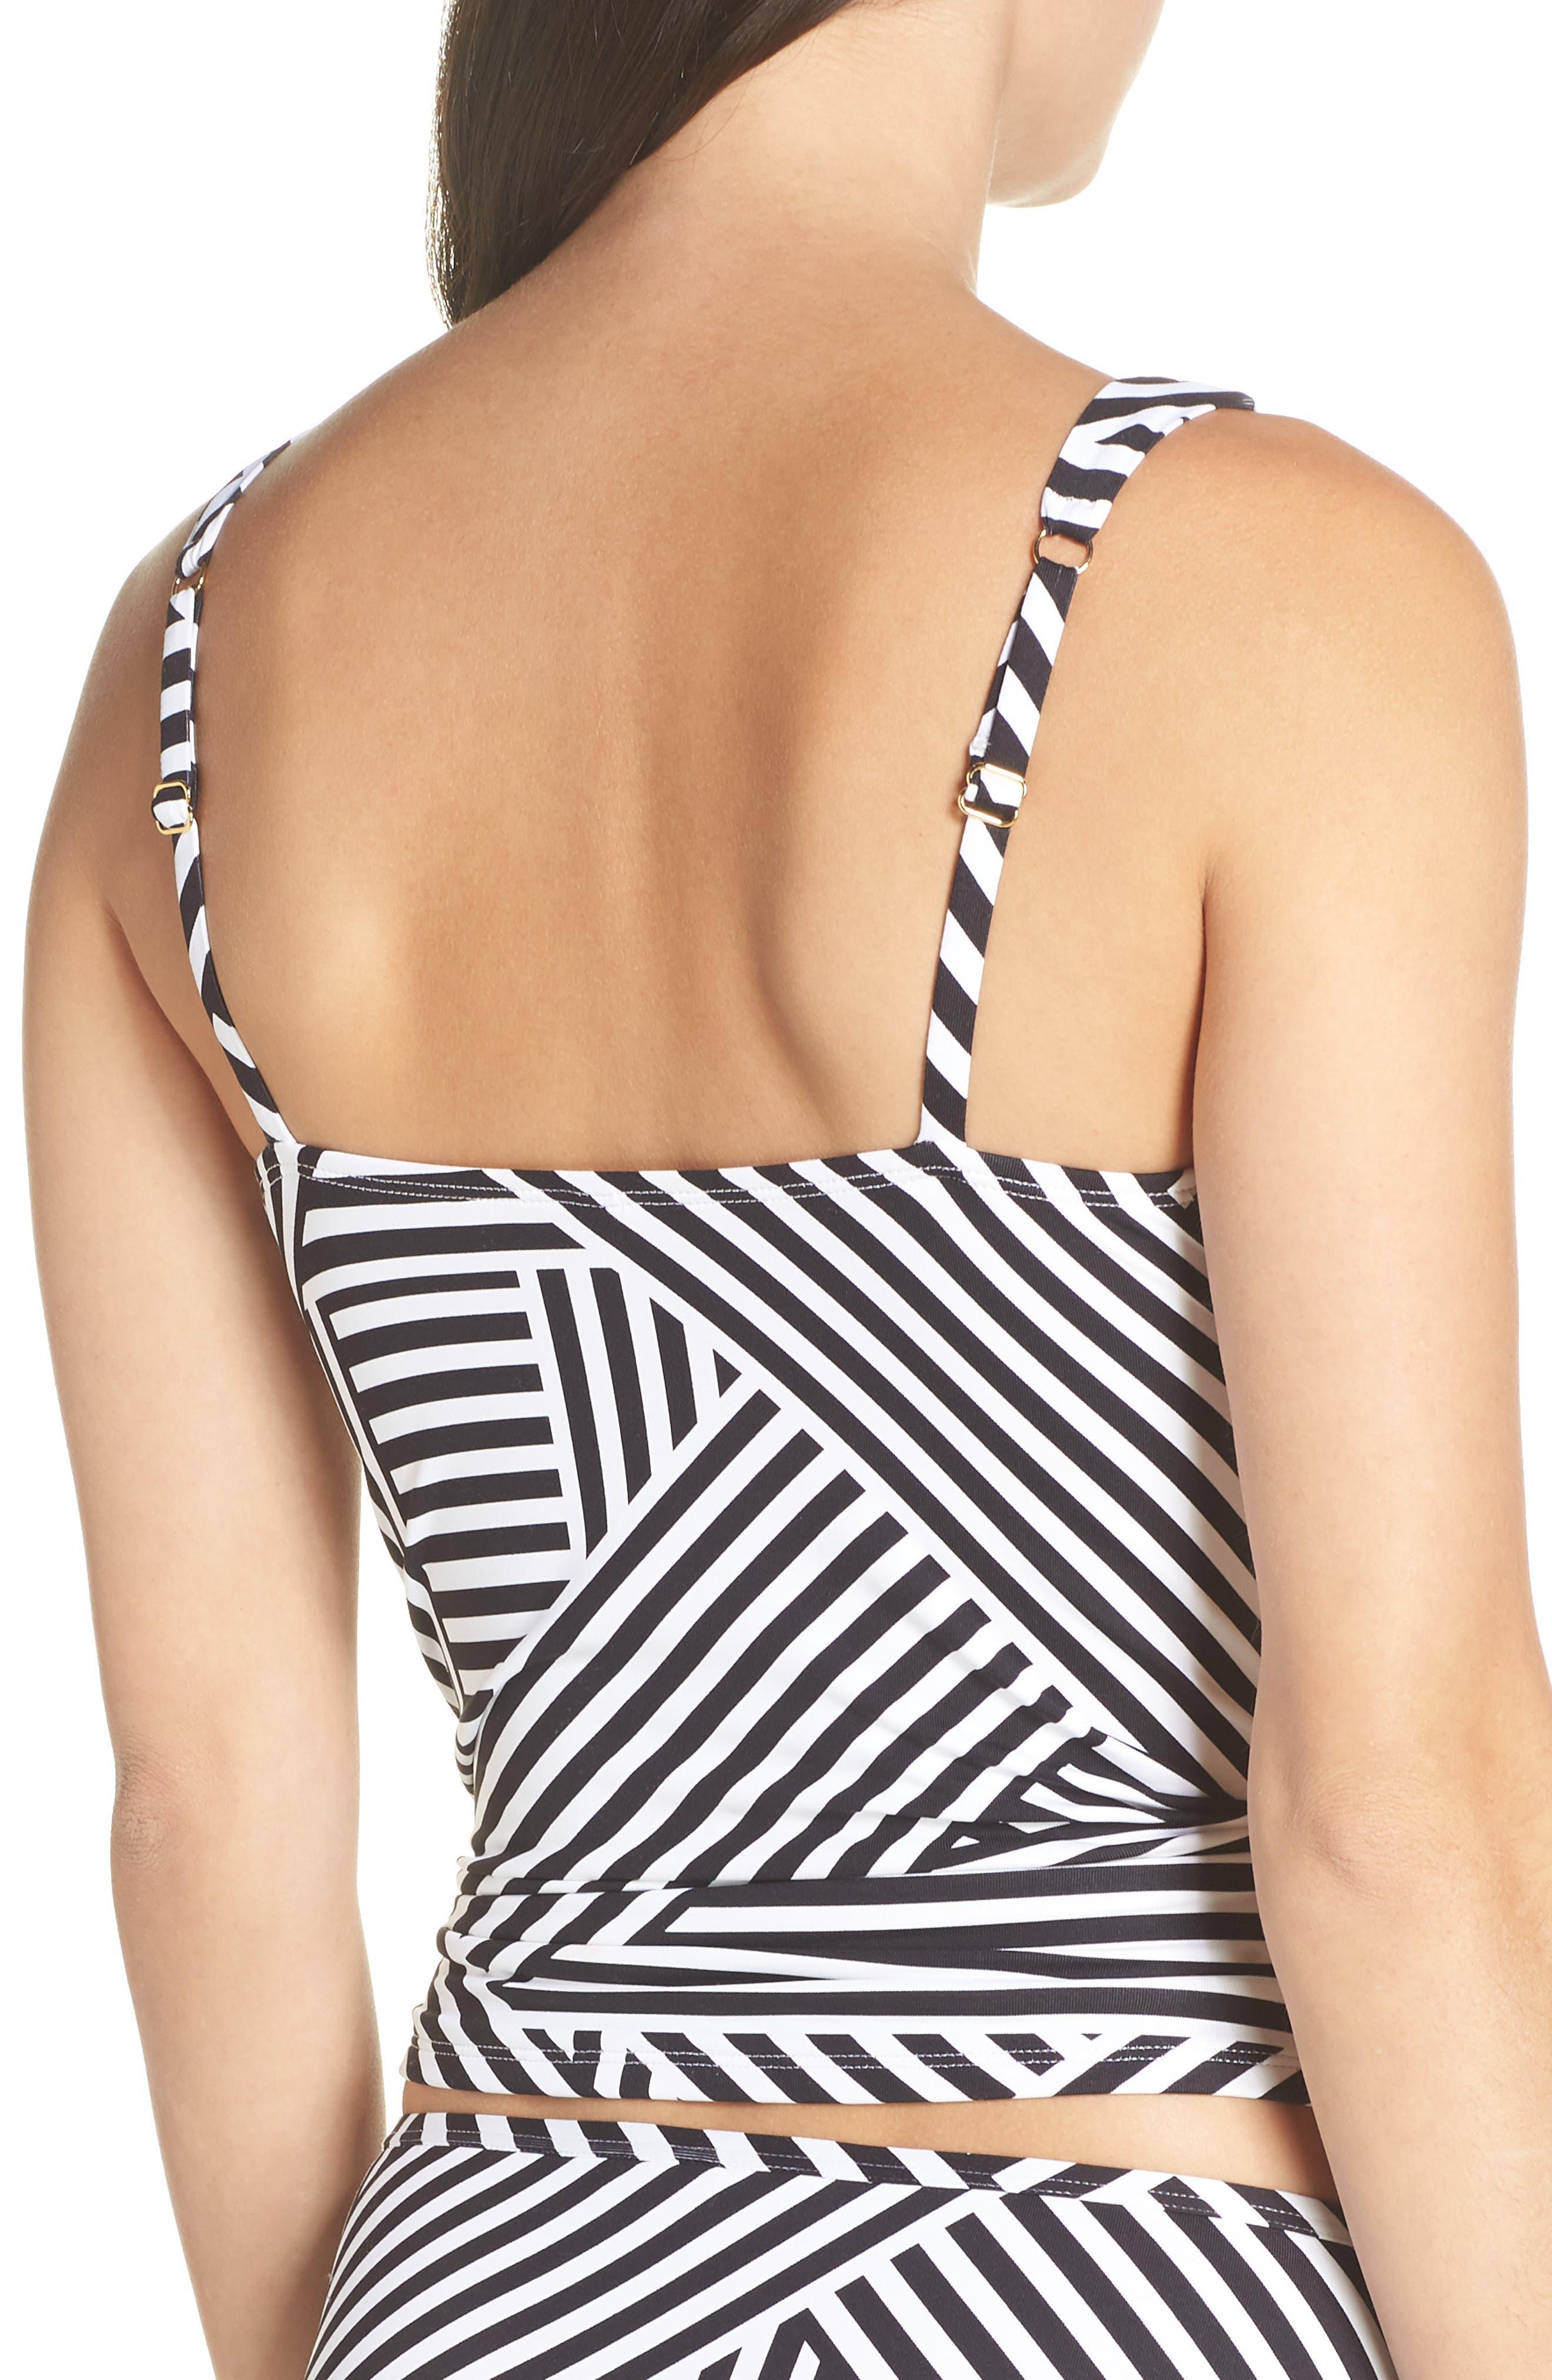 TOMMY BAHAMA,                             Fractured Stripe Tankini Top,                             Alternate thumbnail 2, color,                             BLACK/ WHITE